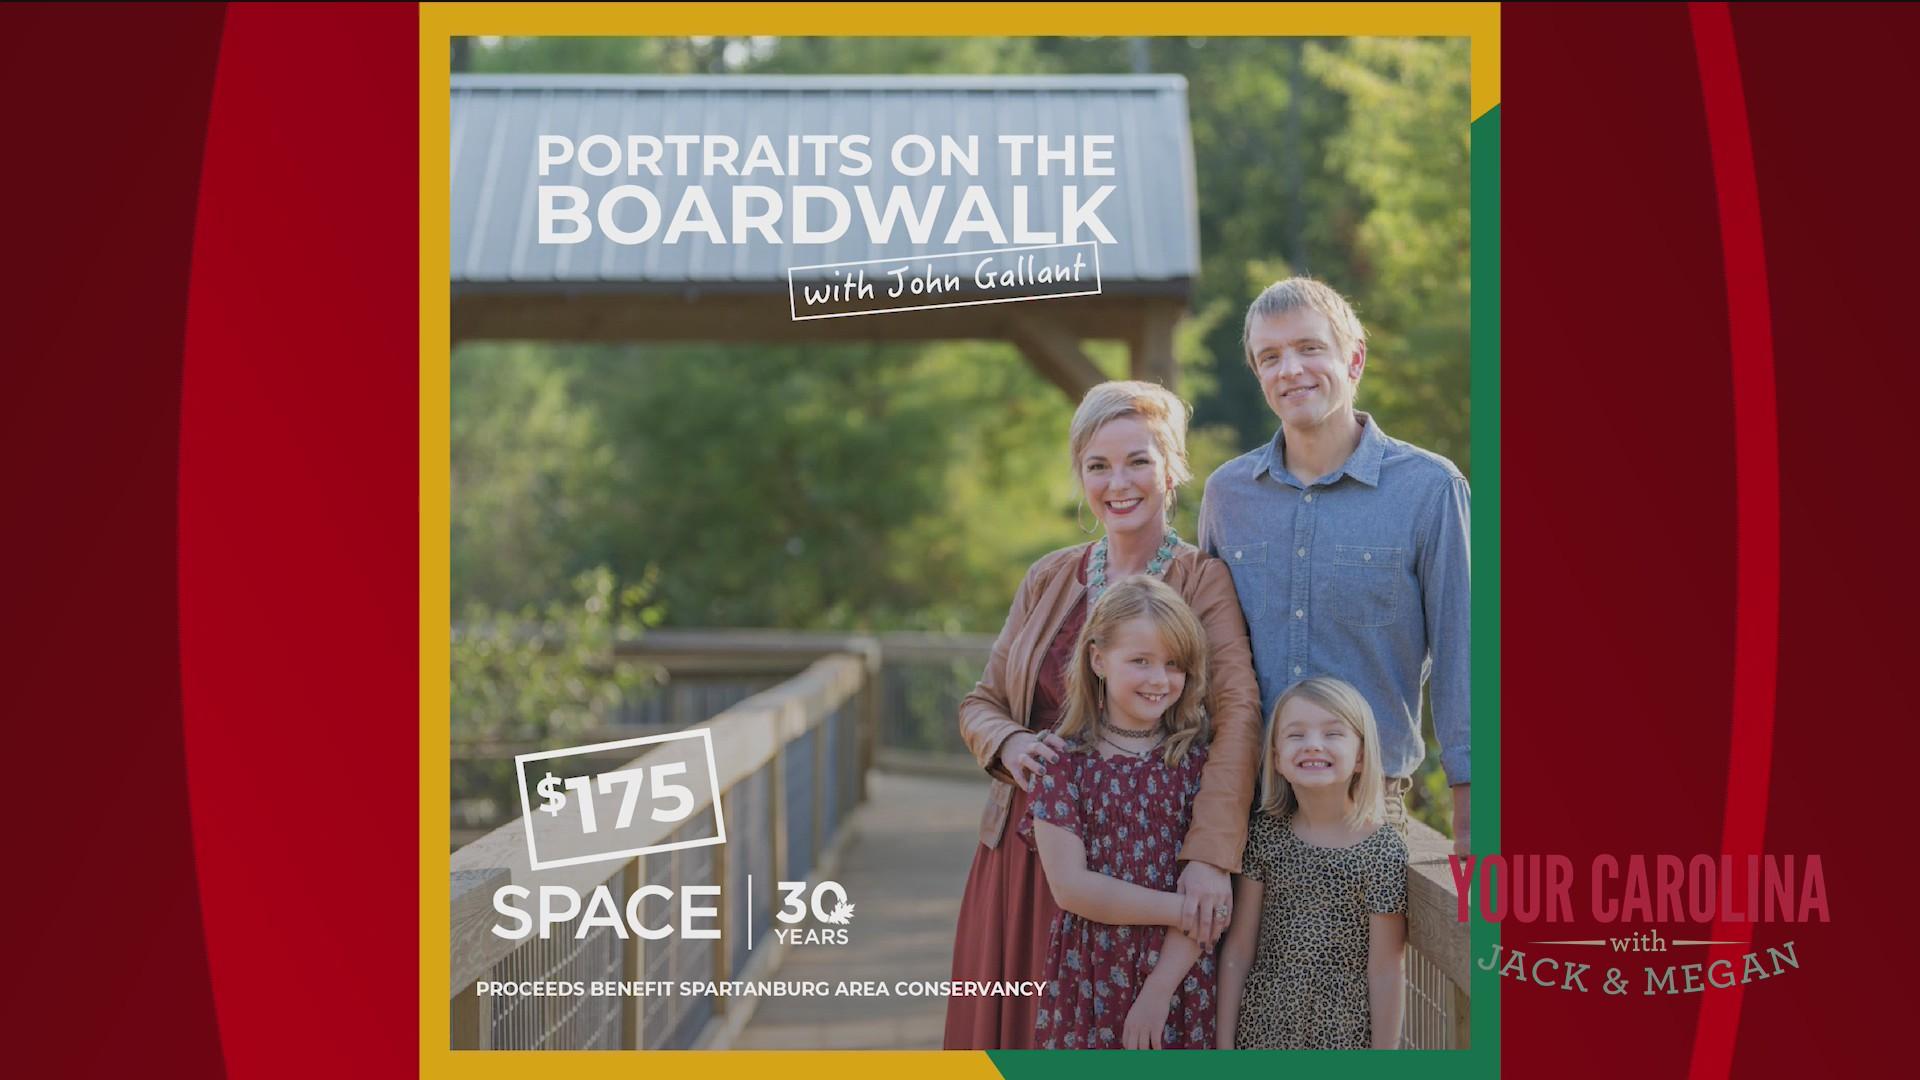 Boardwalk Portraits